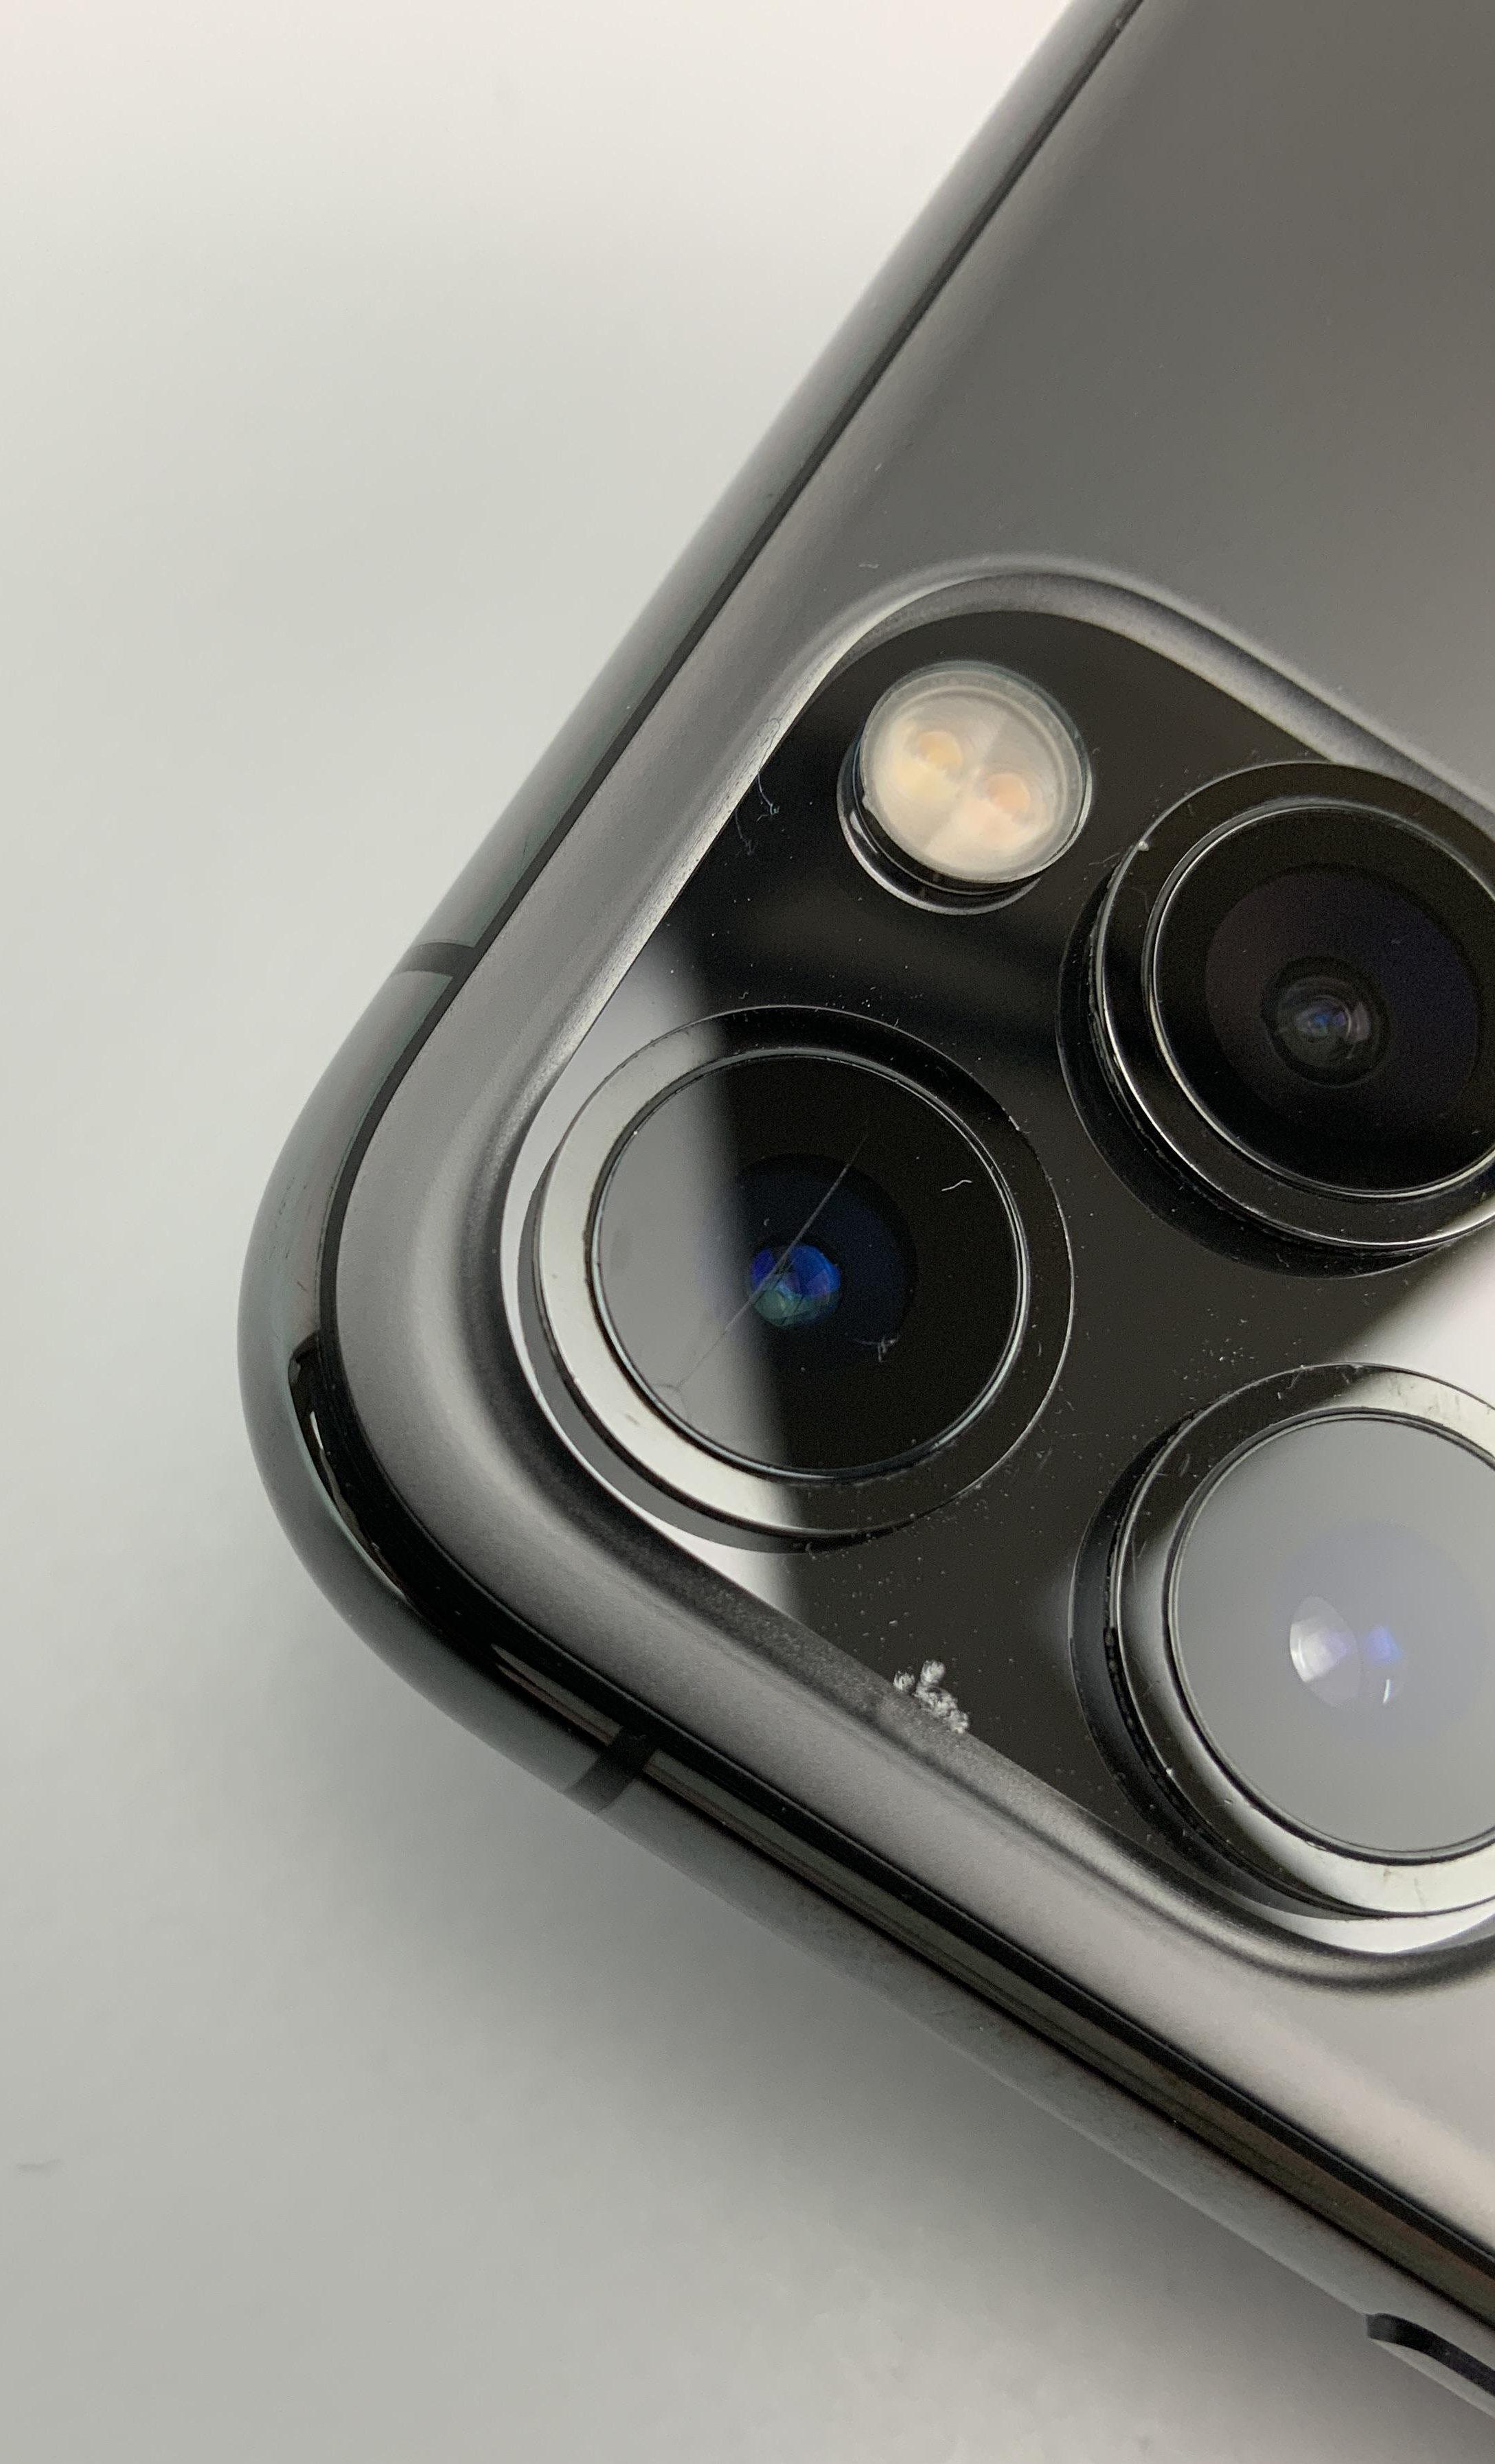 iPhone 11 Pro 512GB, 512GB, Space Gray, Kuva 4